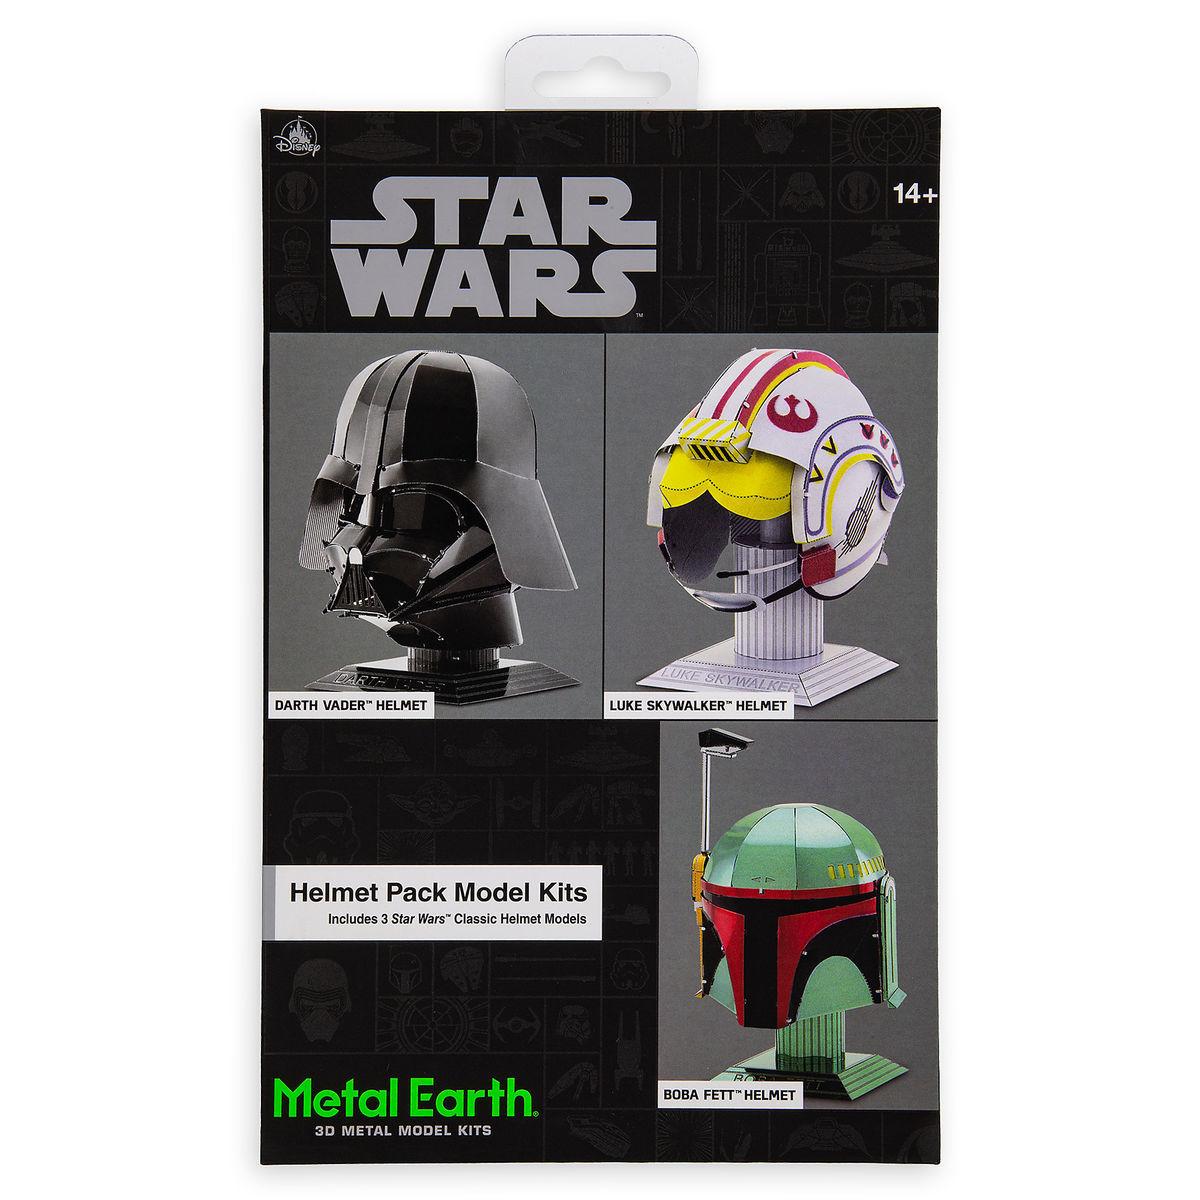 dcc8a6799 Disney 3D Model Kit - Metal Earth - Star Wars Helmet Pack - Darth Vader